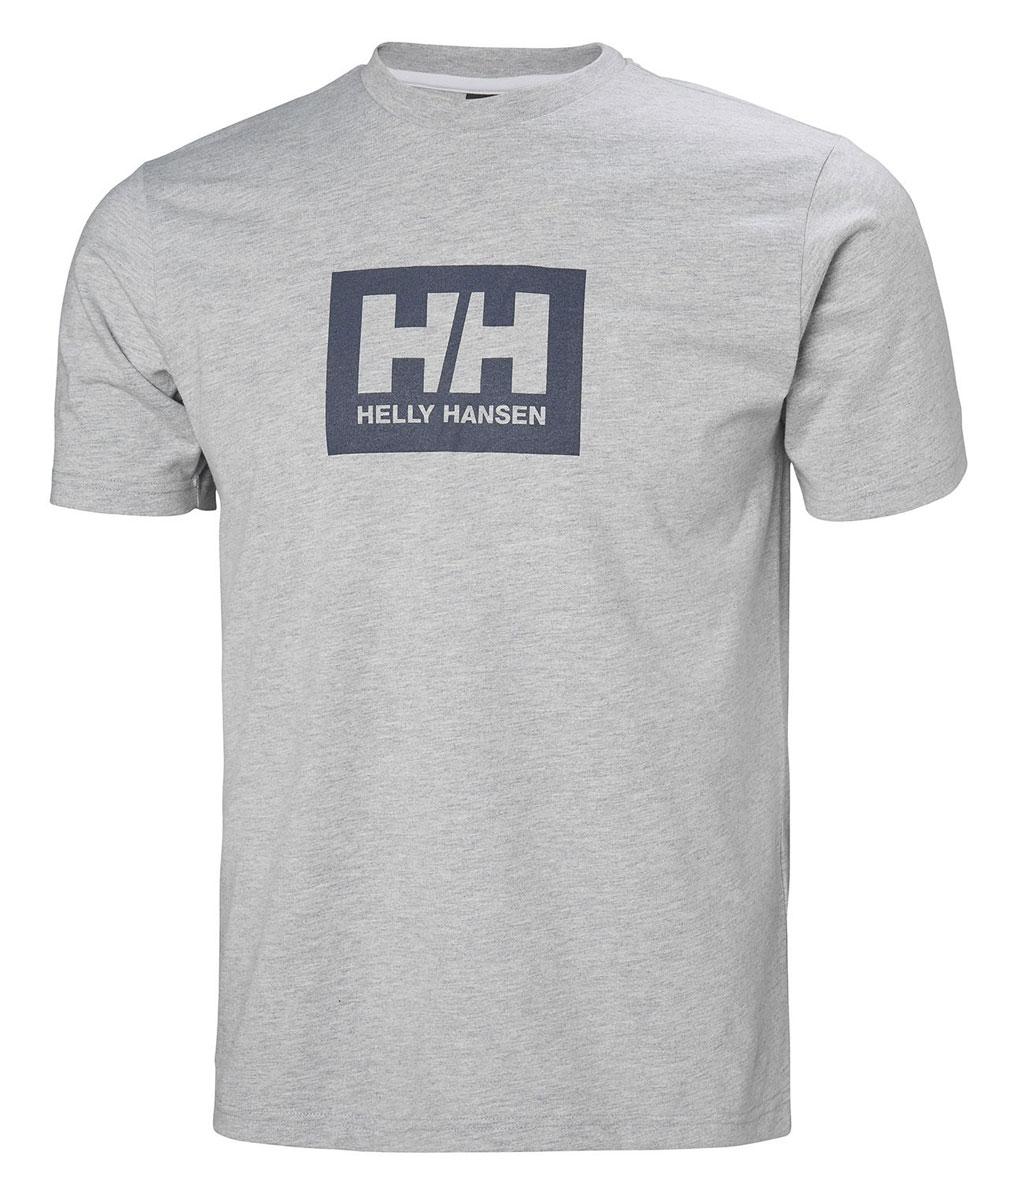 Худи Helly Hansen Tokyo Hoodie худи мужское helly hansen tokyo hoodie цвет светло серый 53289 949 размер l 50